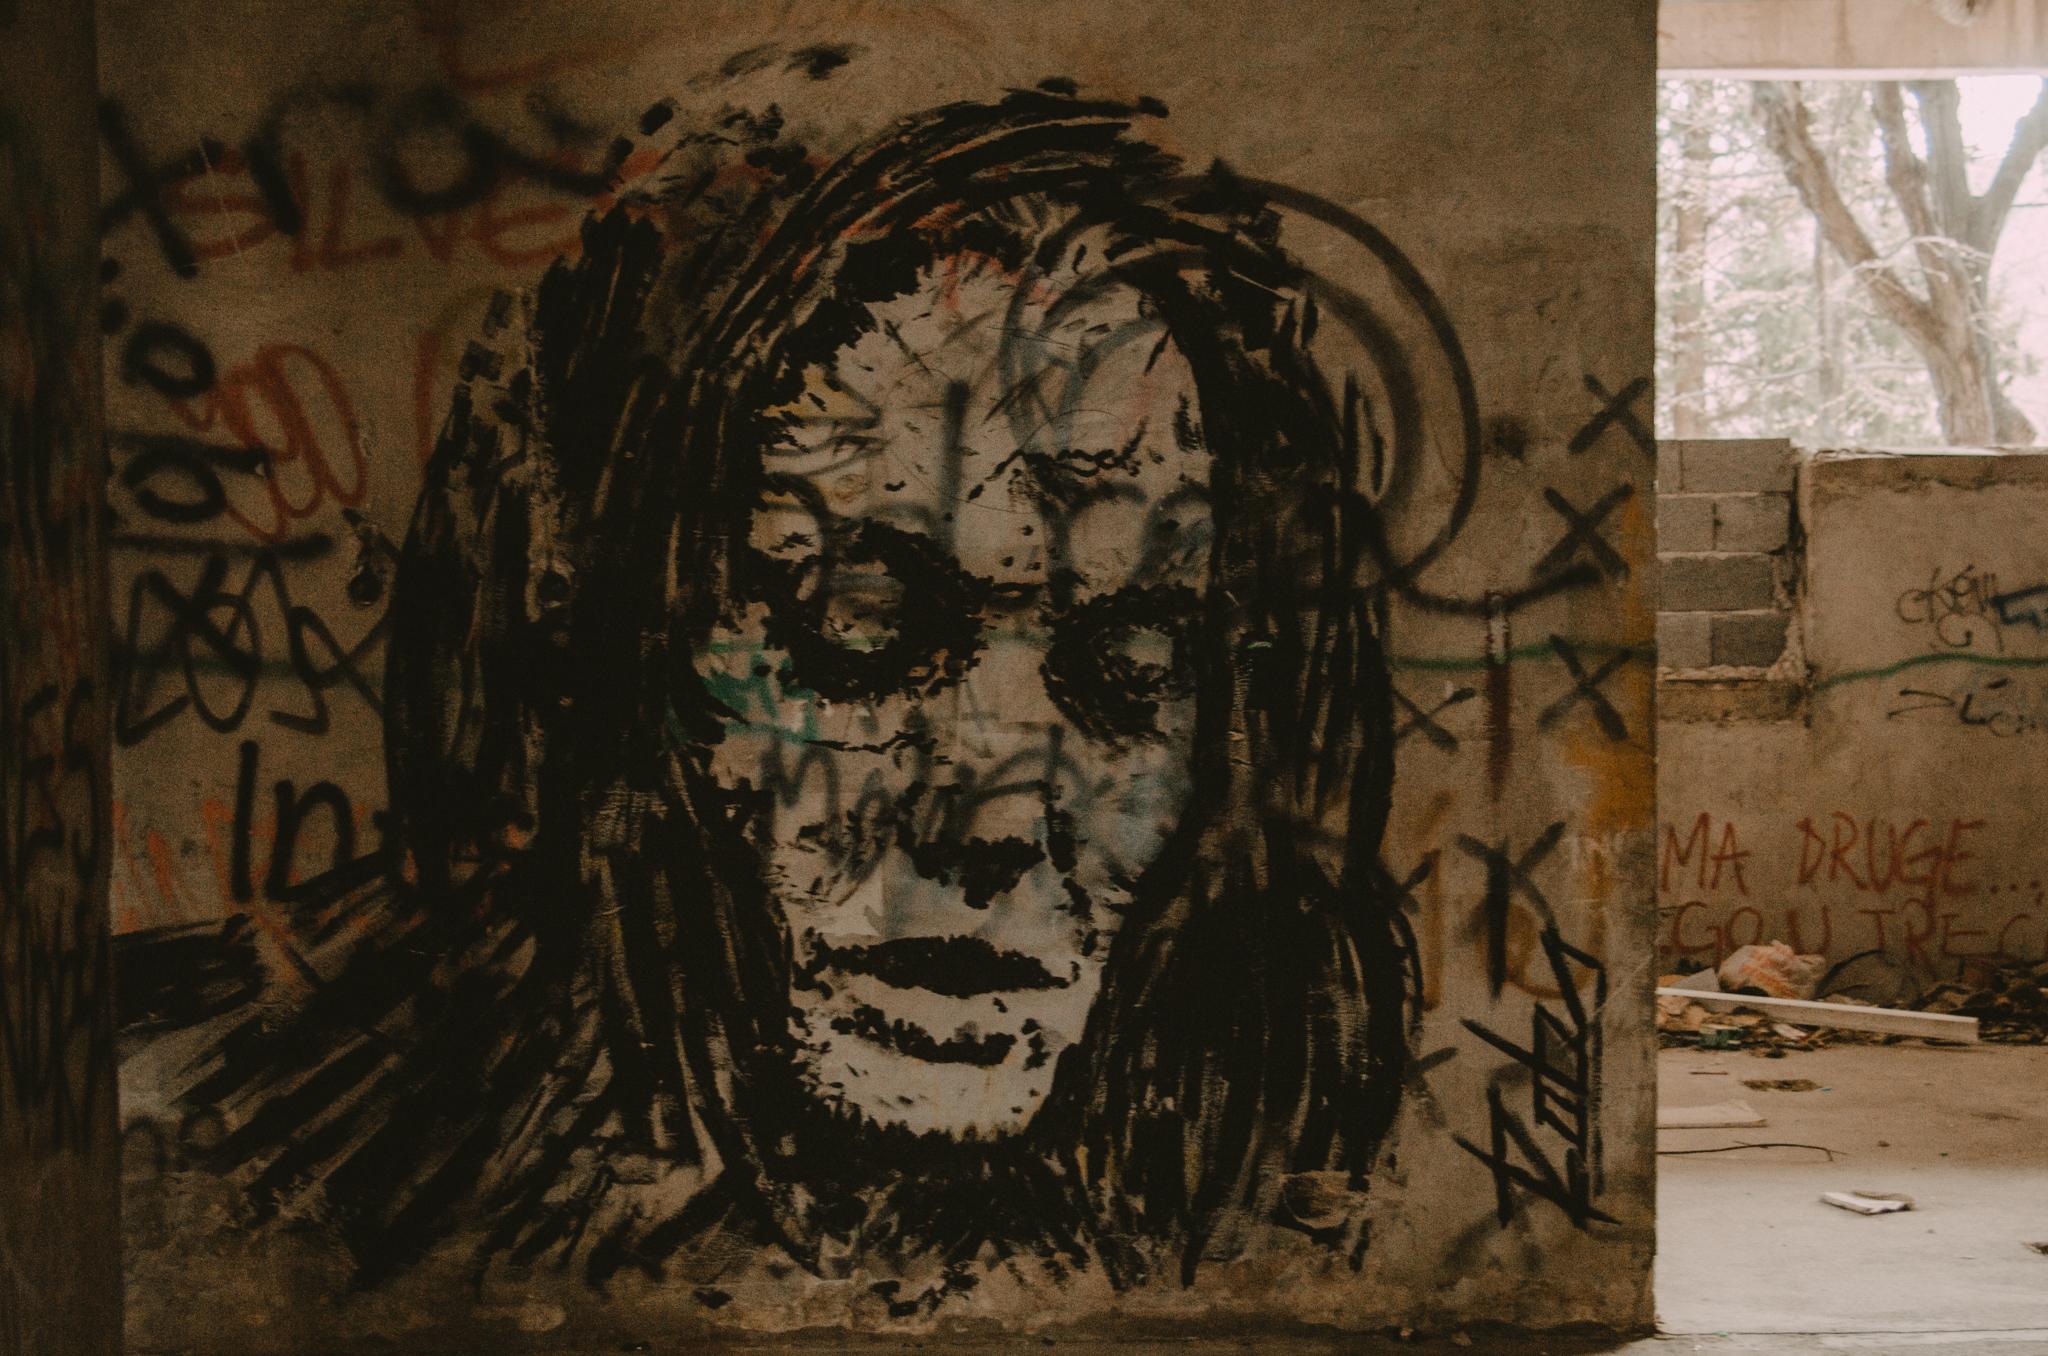 mostar-street-art-wieza-snajperow-bosnia-i-hercegowina